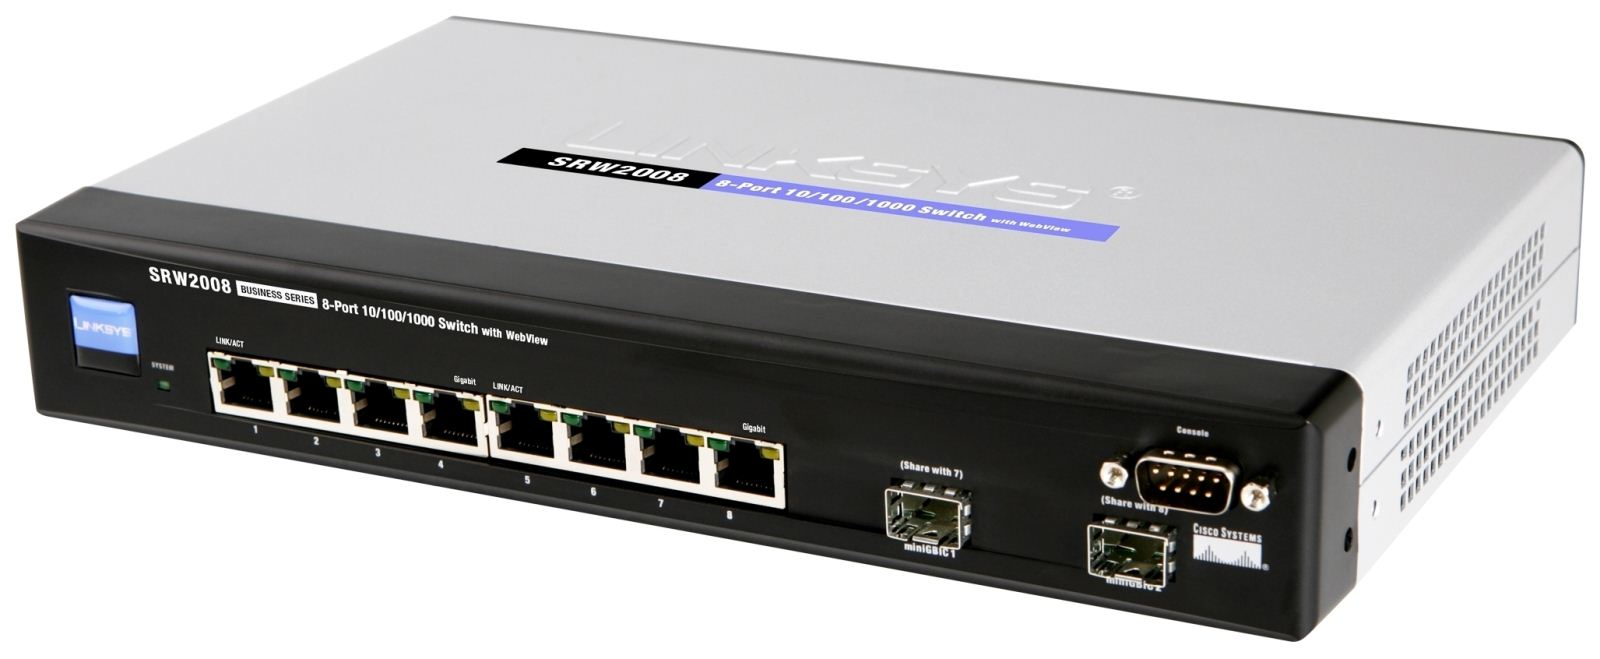 Cisco SRW2008, 8 port Gigabit Switch   WebView